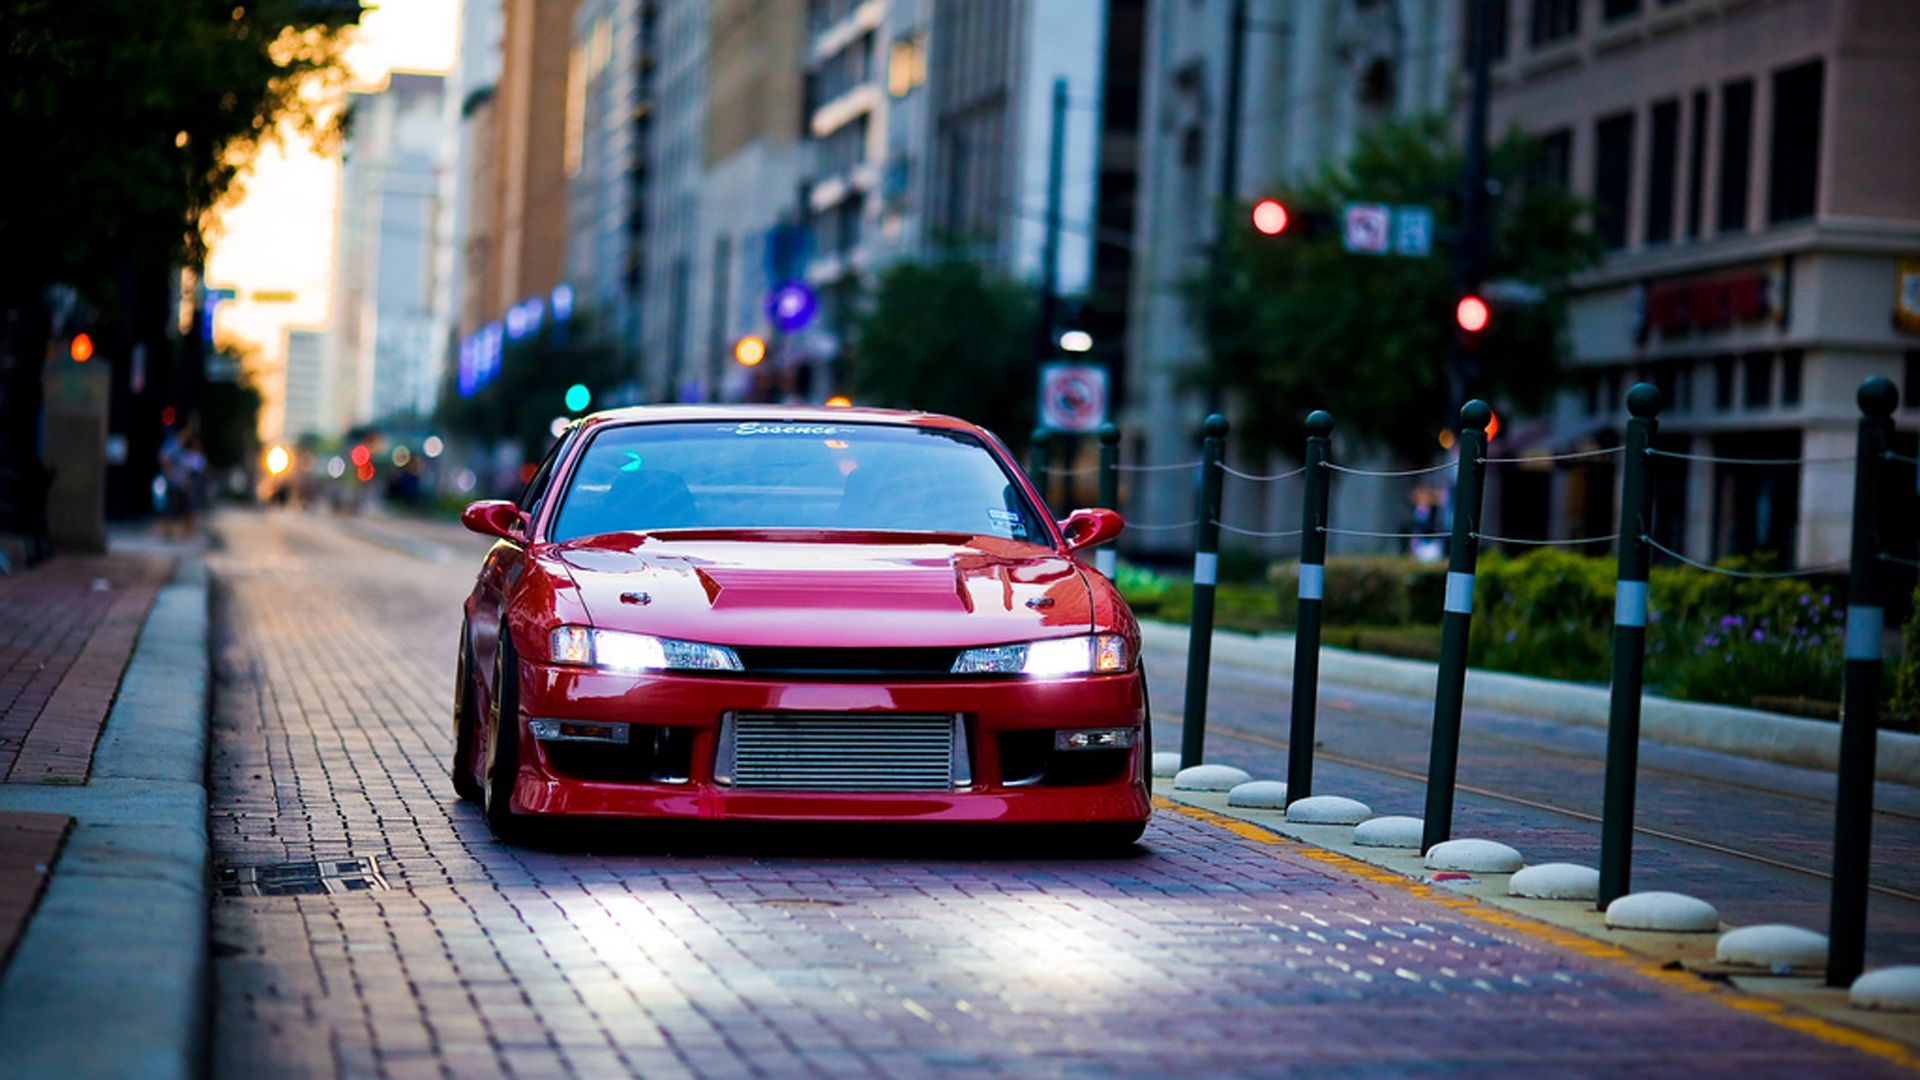 Nissan Silvia S14 Hd Wallpaper 999hdwallpaper Nissan Silvia